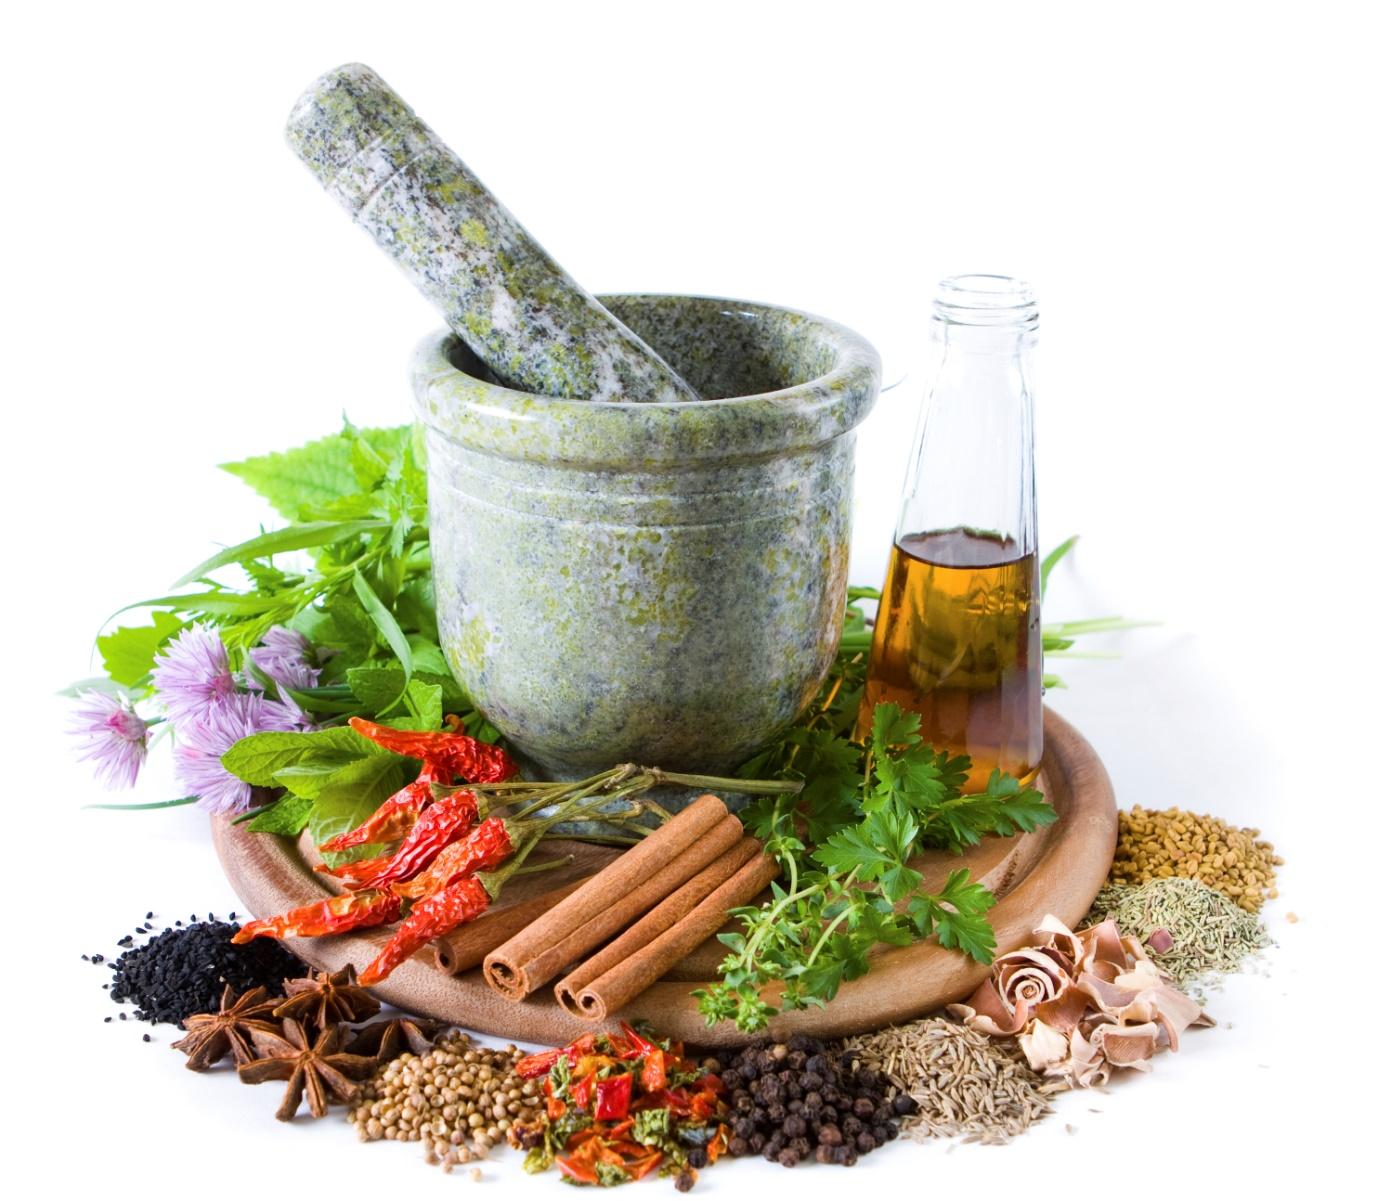 http://www.acupunctureinphila.com/wp-content/uploads/2015/10/Herbal-Mediciine.jpg